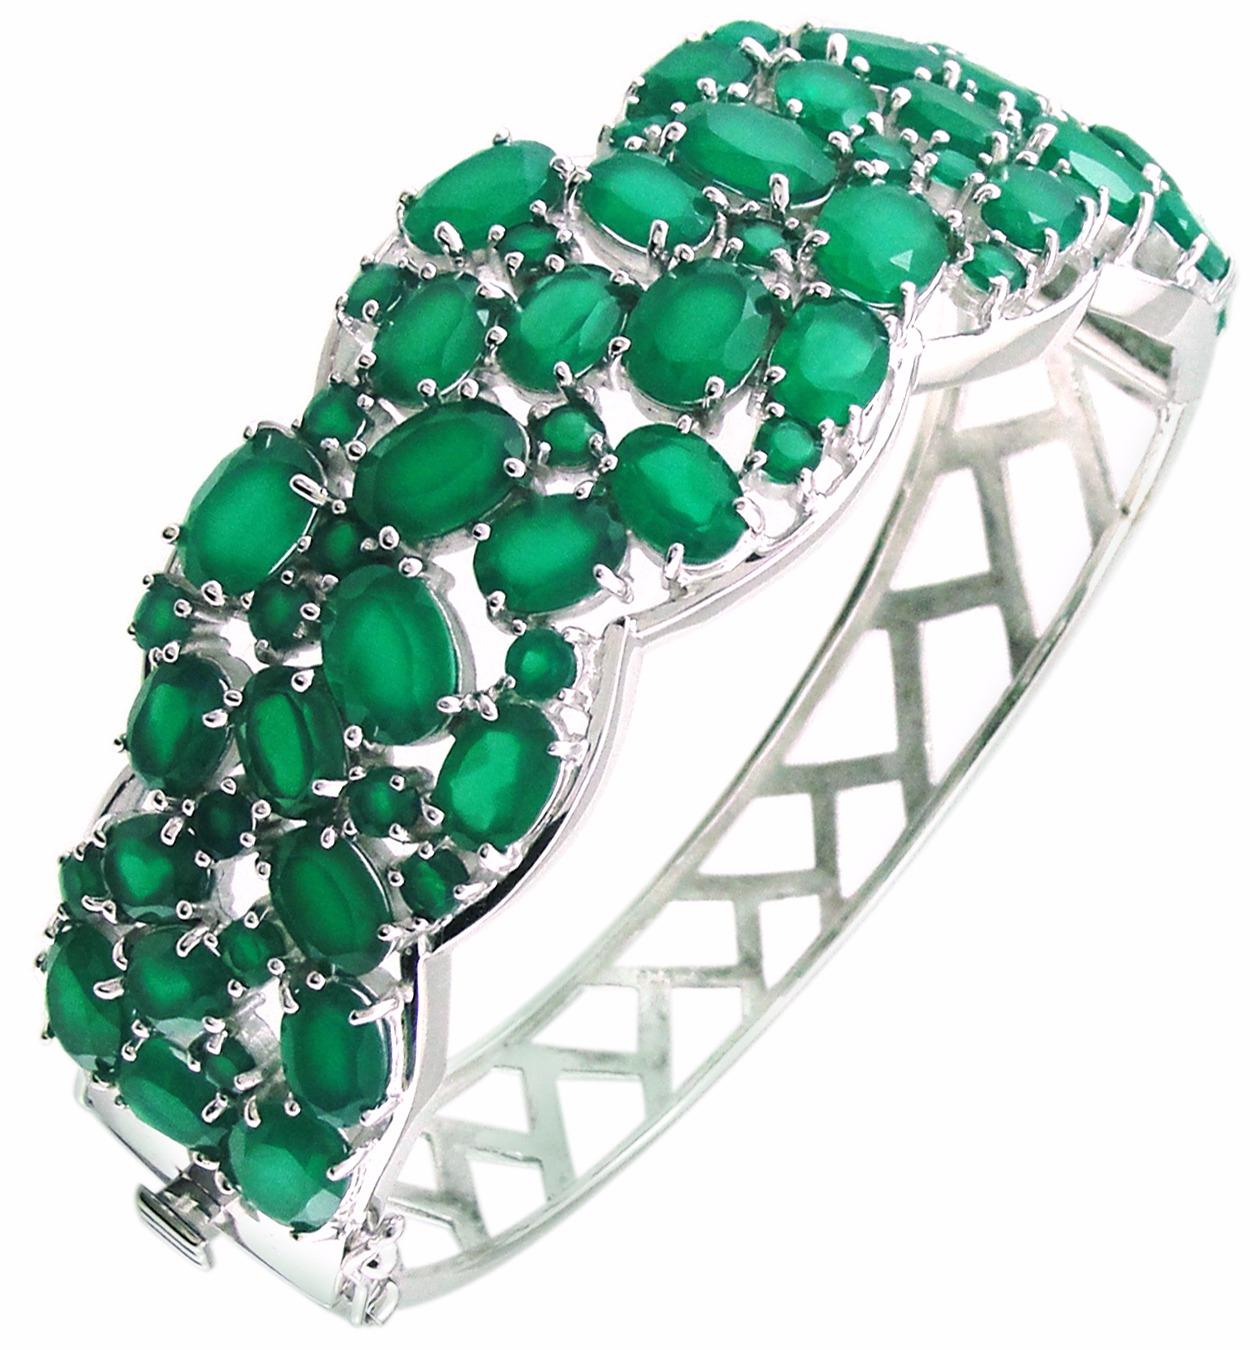 Браслет из серебра с агатом Balex Jewellery 7405937311